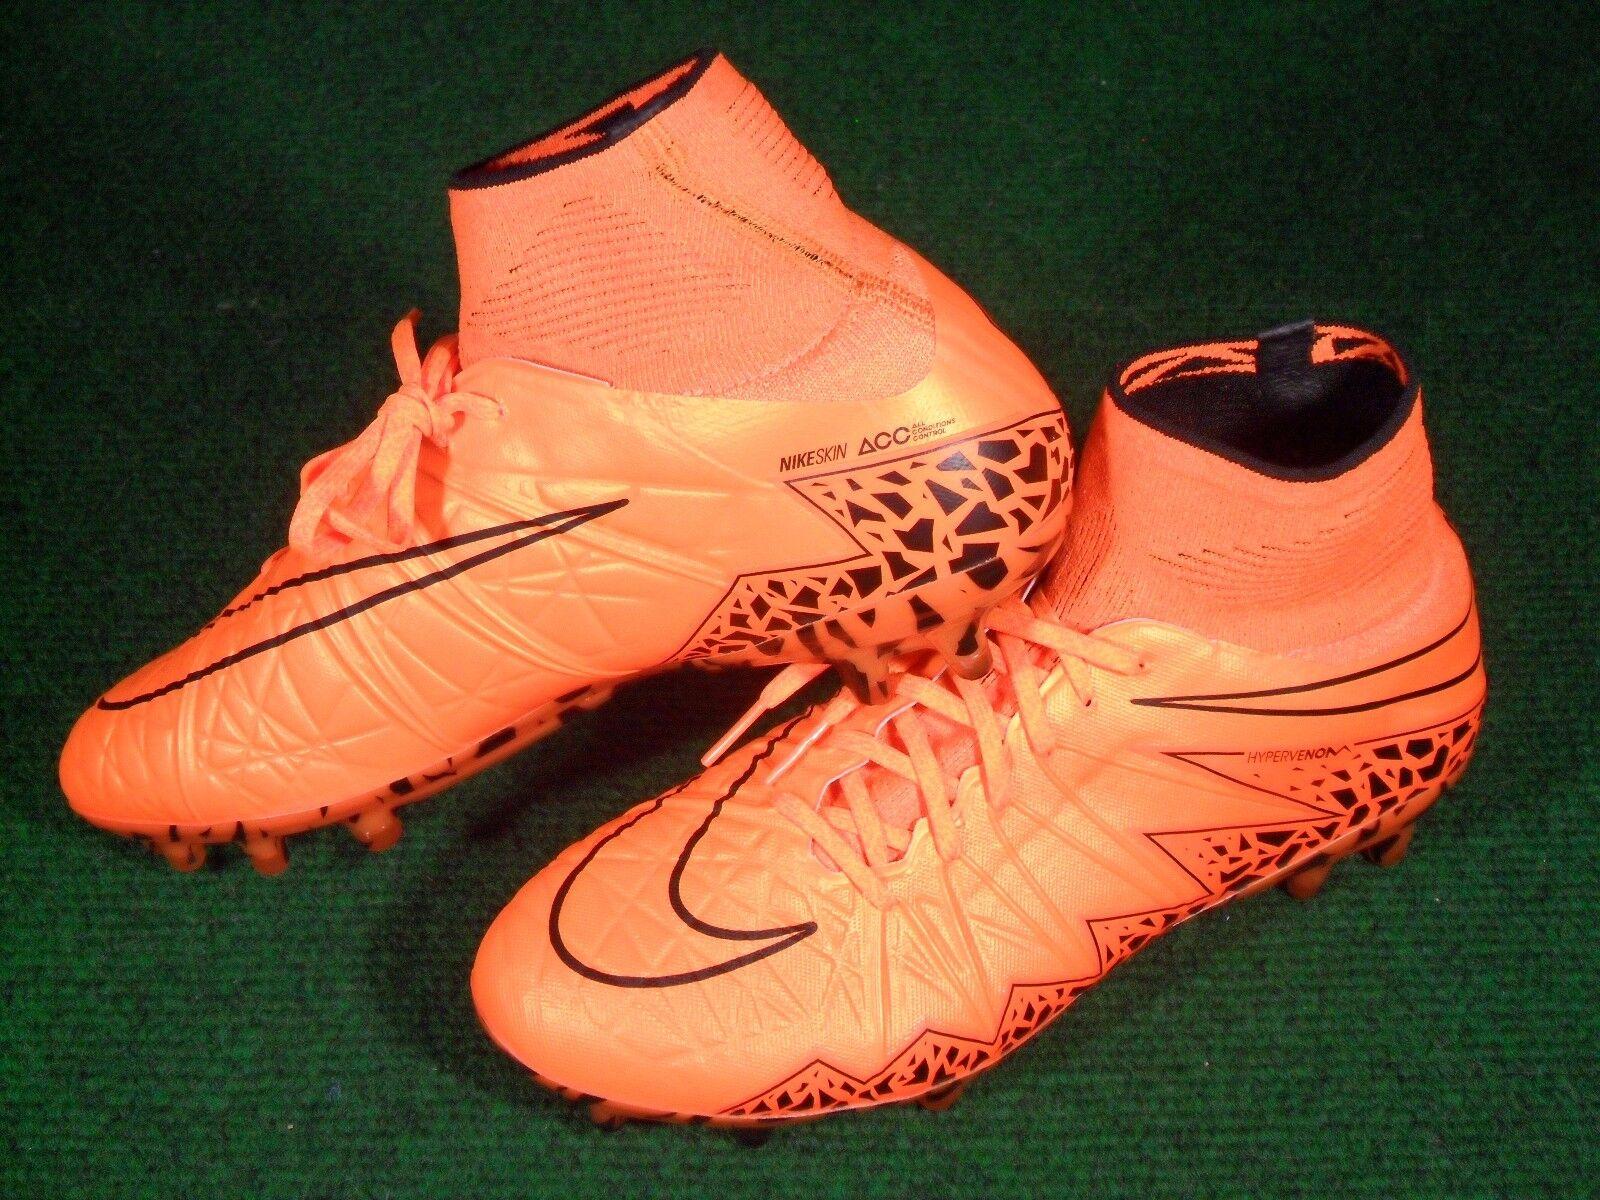 New  Herren Hypervenom Phantom II FG Soccer Football Cleats Football Soccer Stiefel Orange 7.5 747213 900075